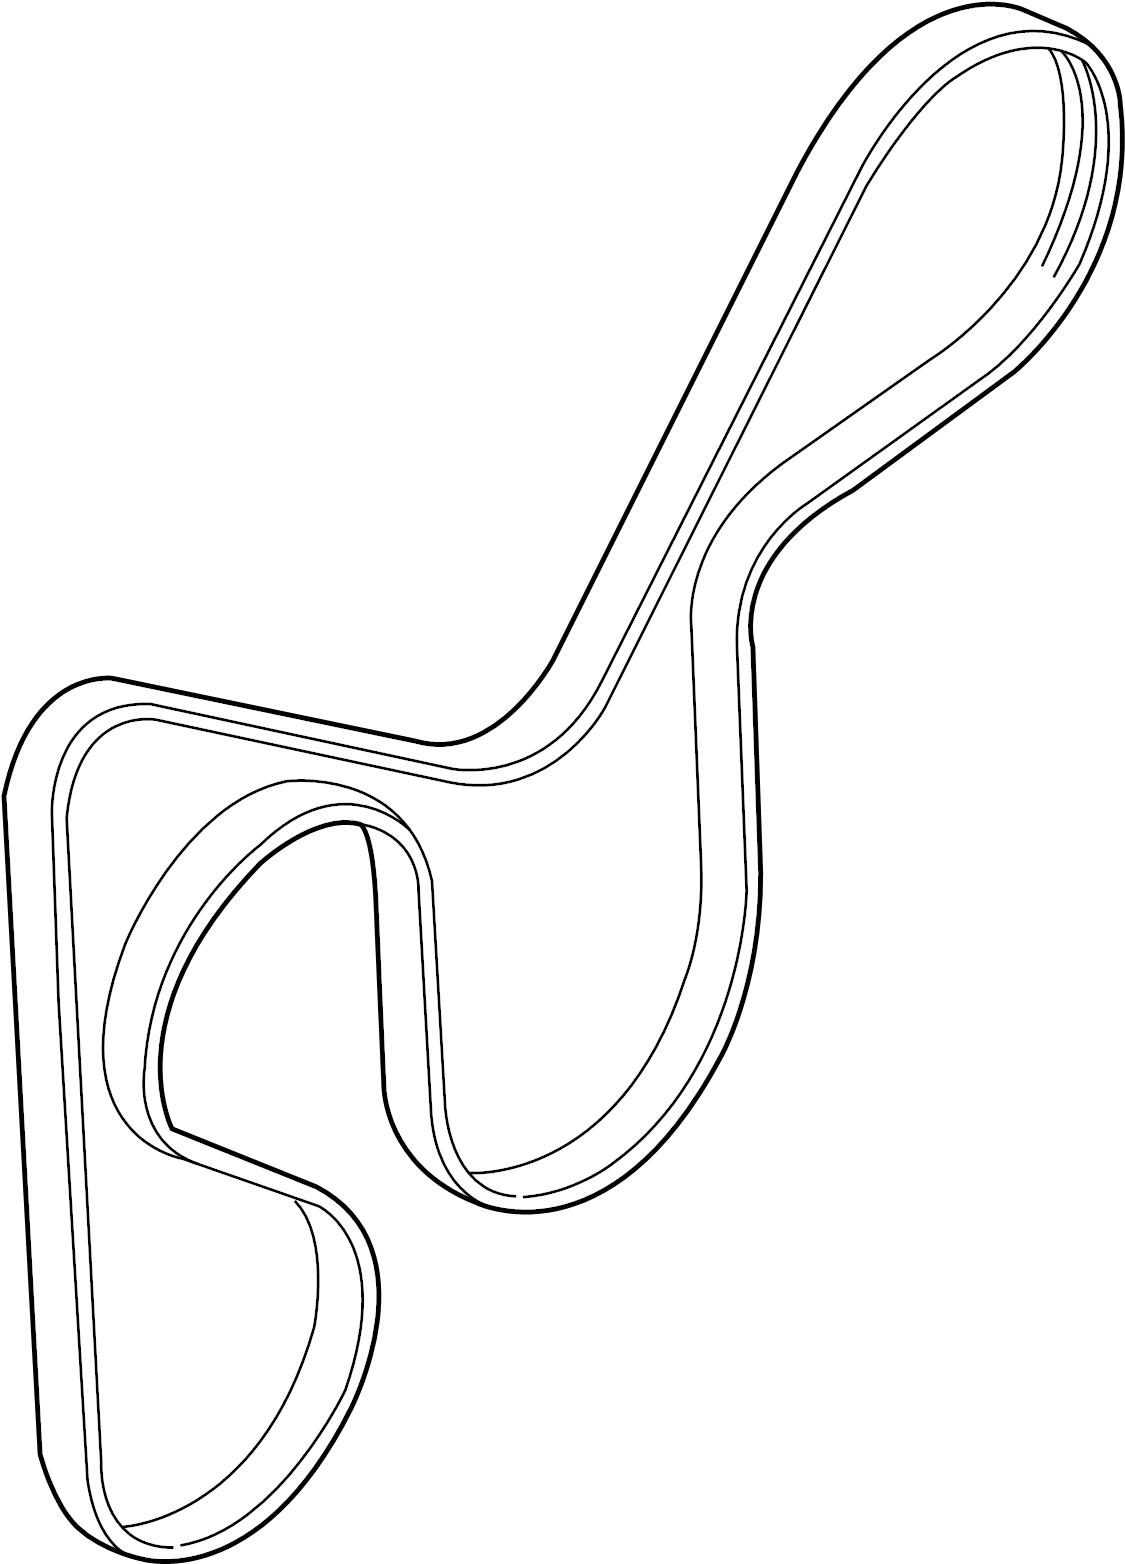 2005 Hyundai Sonata Serpentine Belt Diagram | Wiring Diagram Database